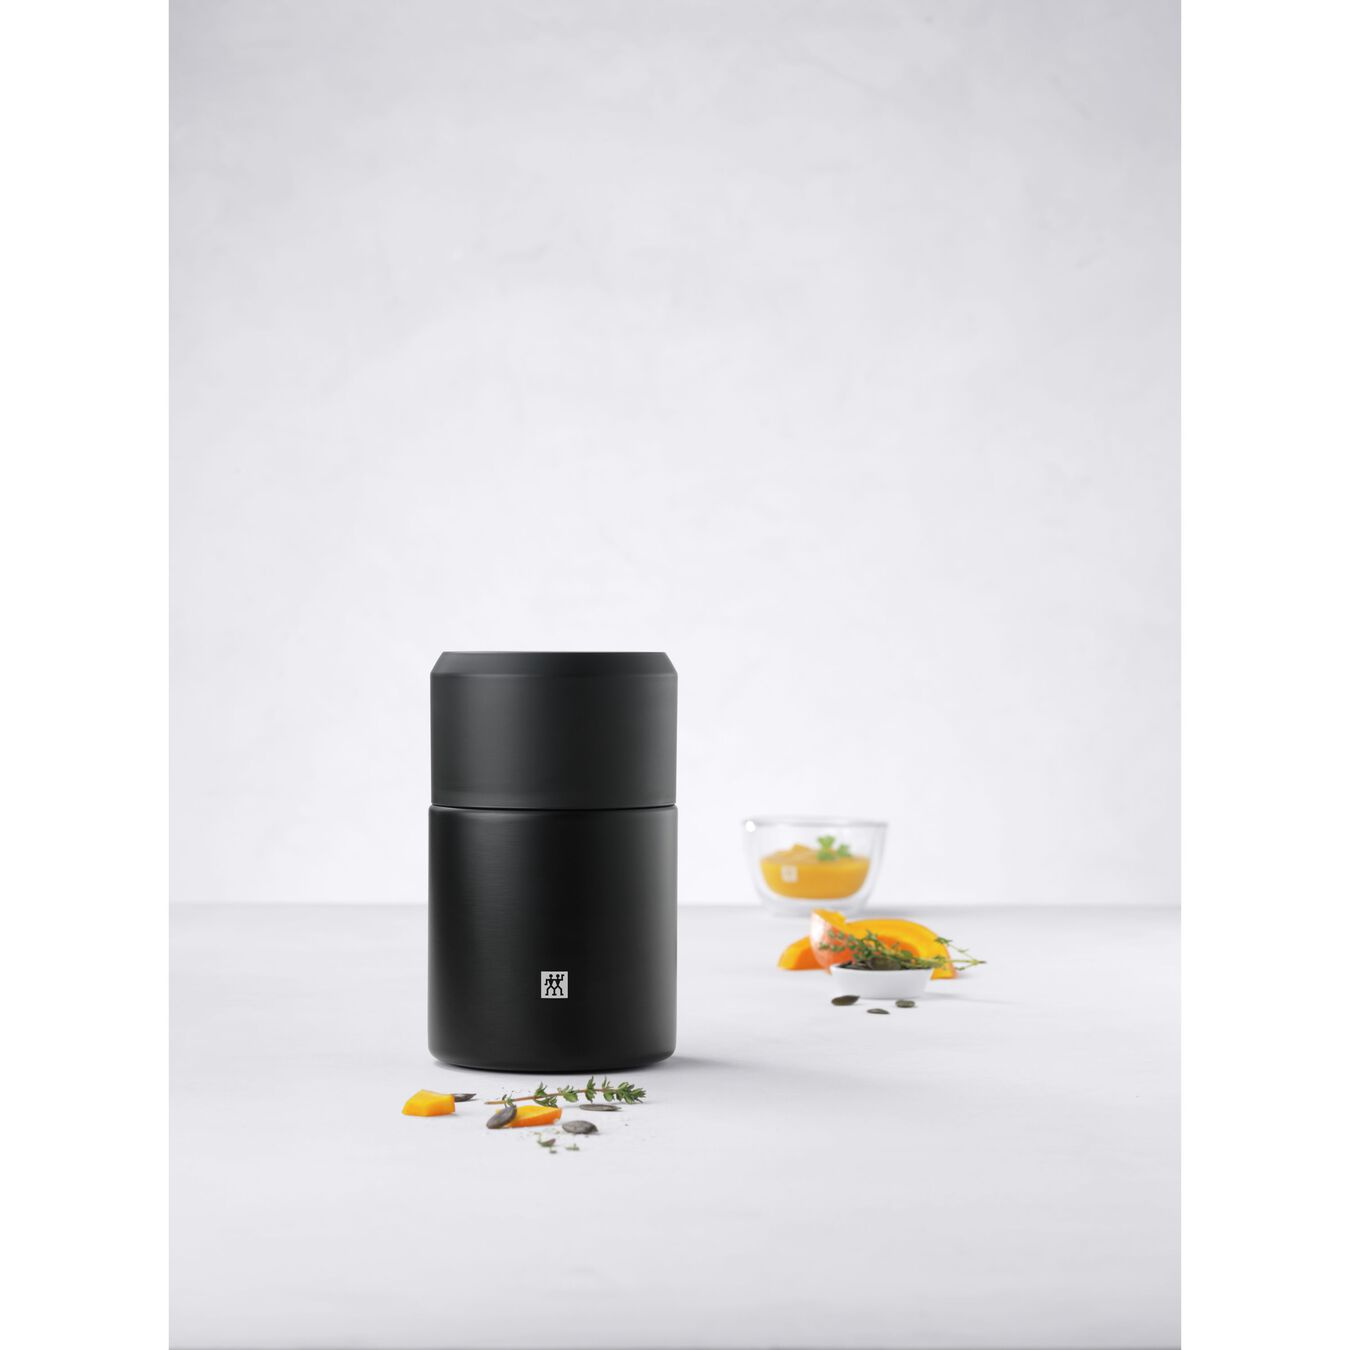 Recipiente alimentare - 700 ml, acciaio inox, nero,,large 6